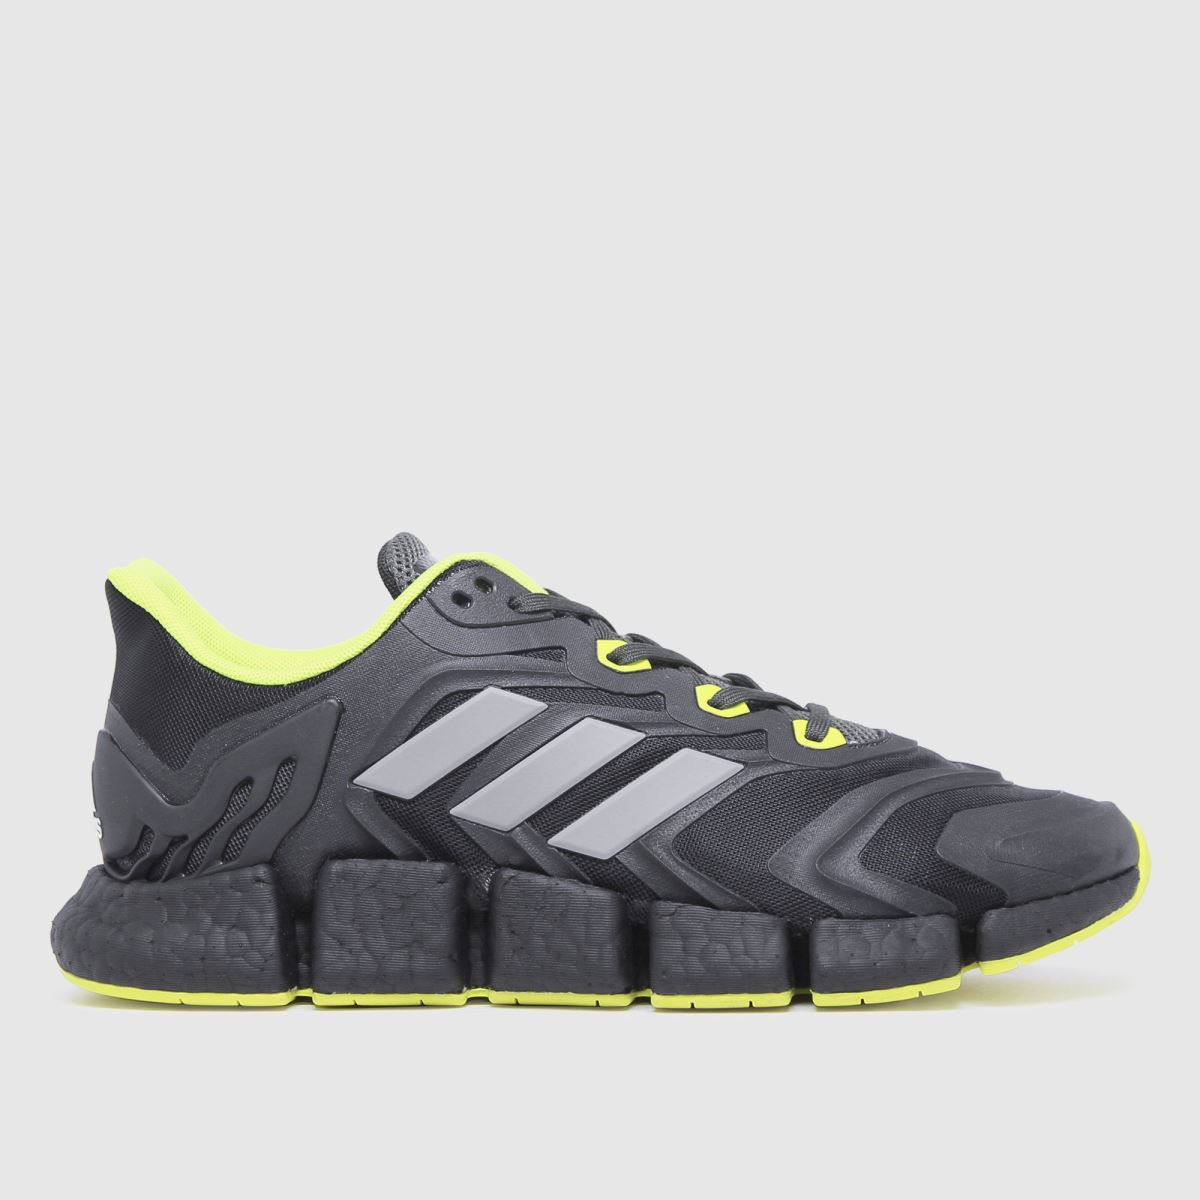 Adidas Black Climacool Vento Trainers